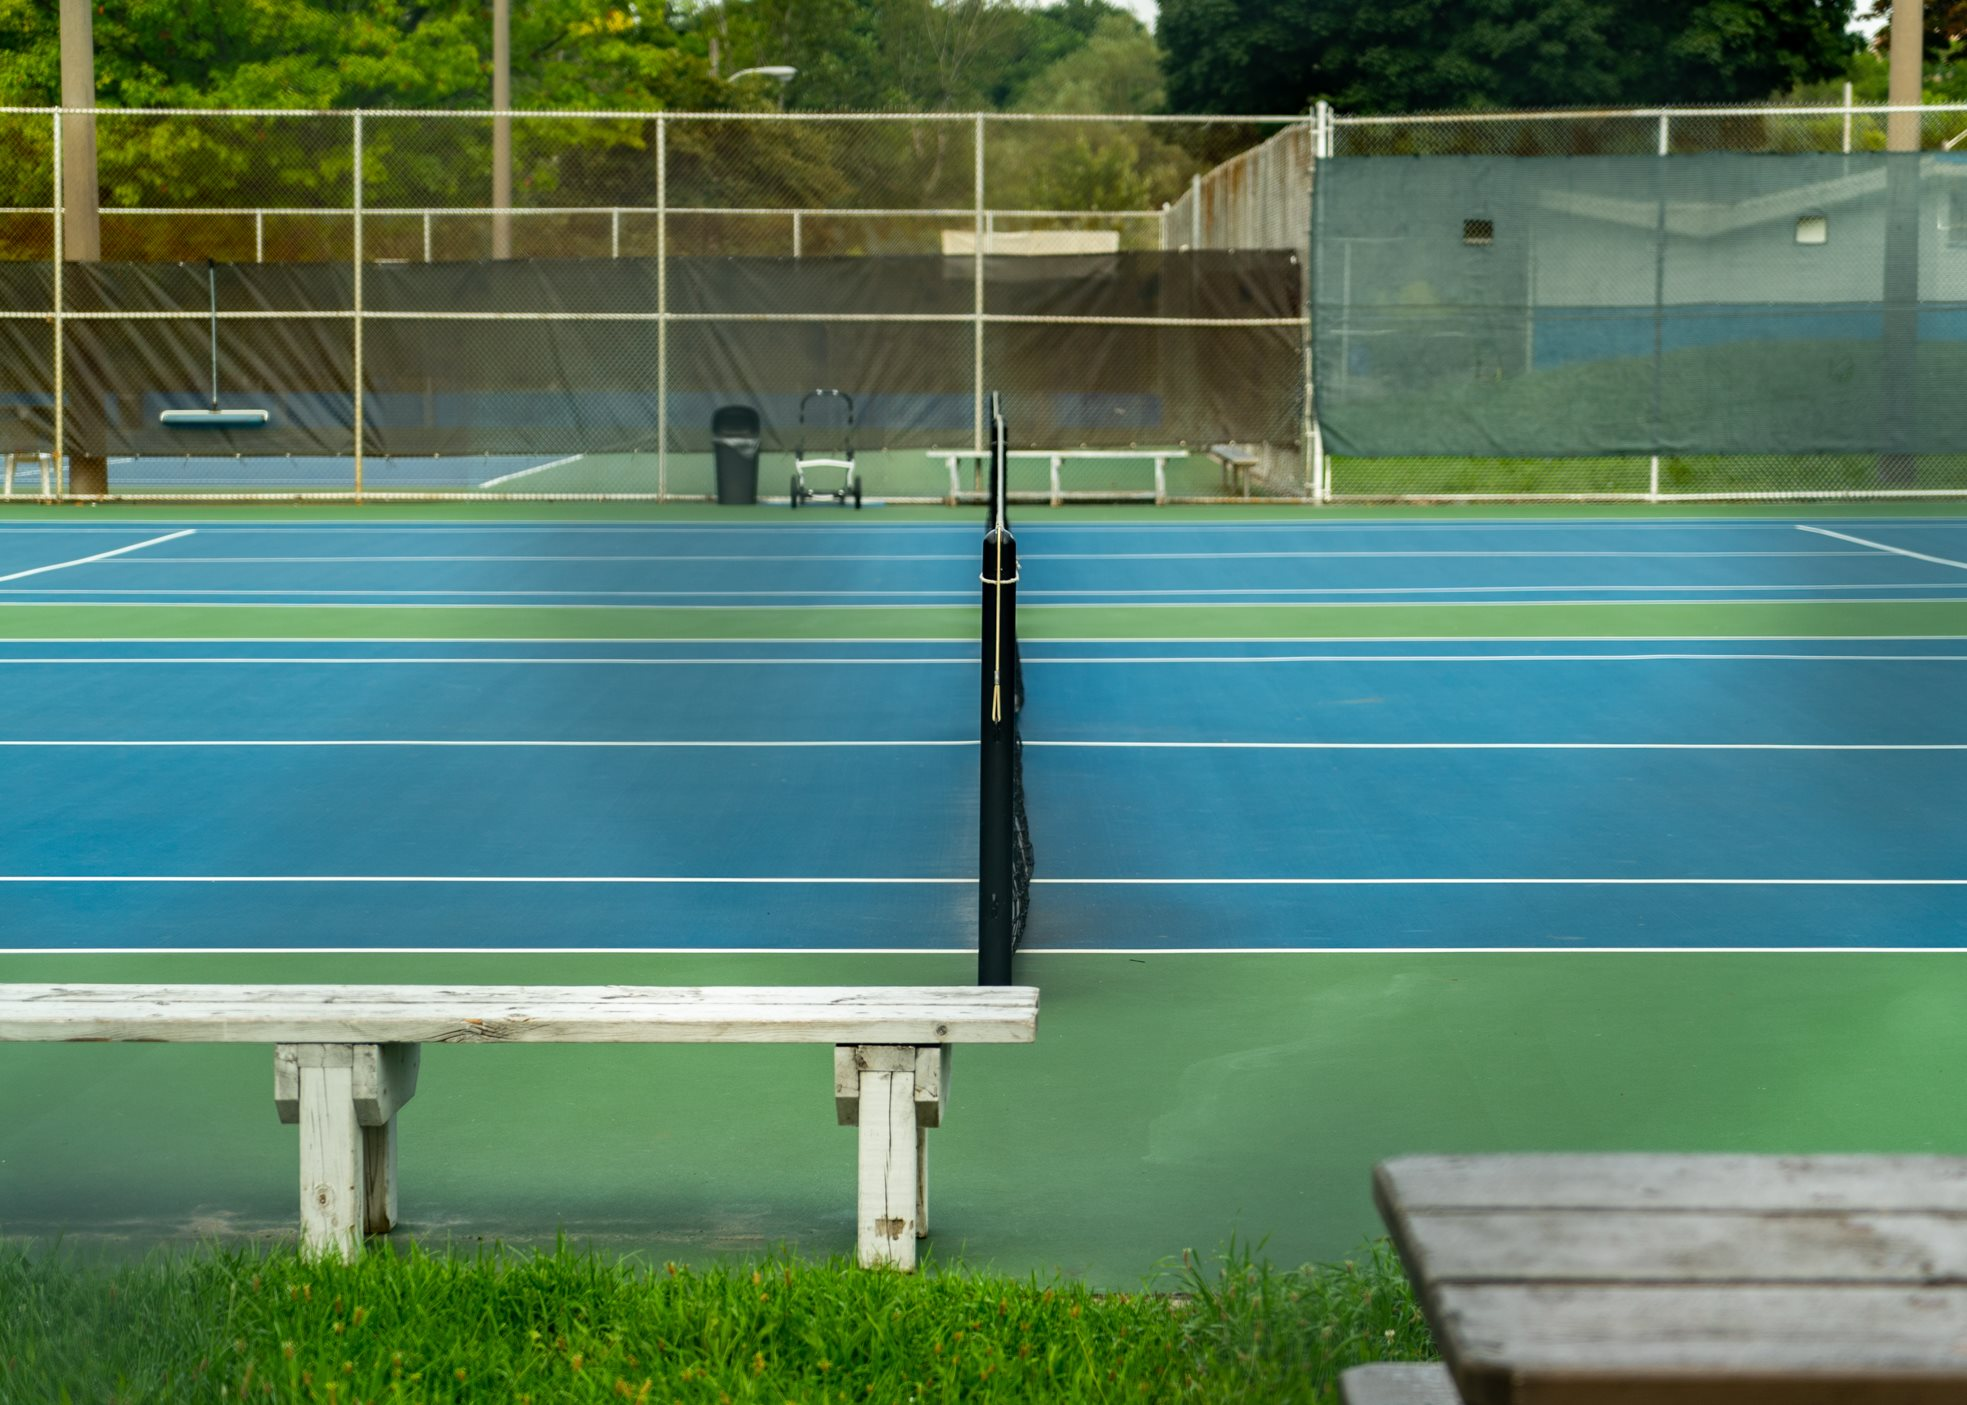 York Weston Tennis Club